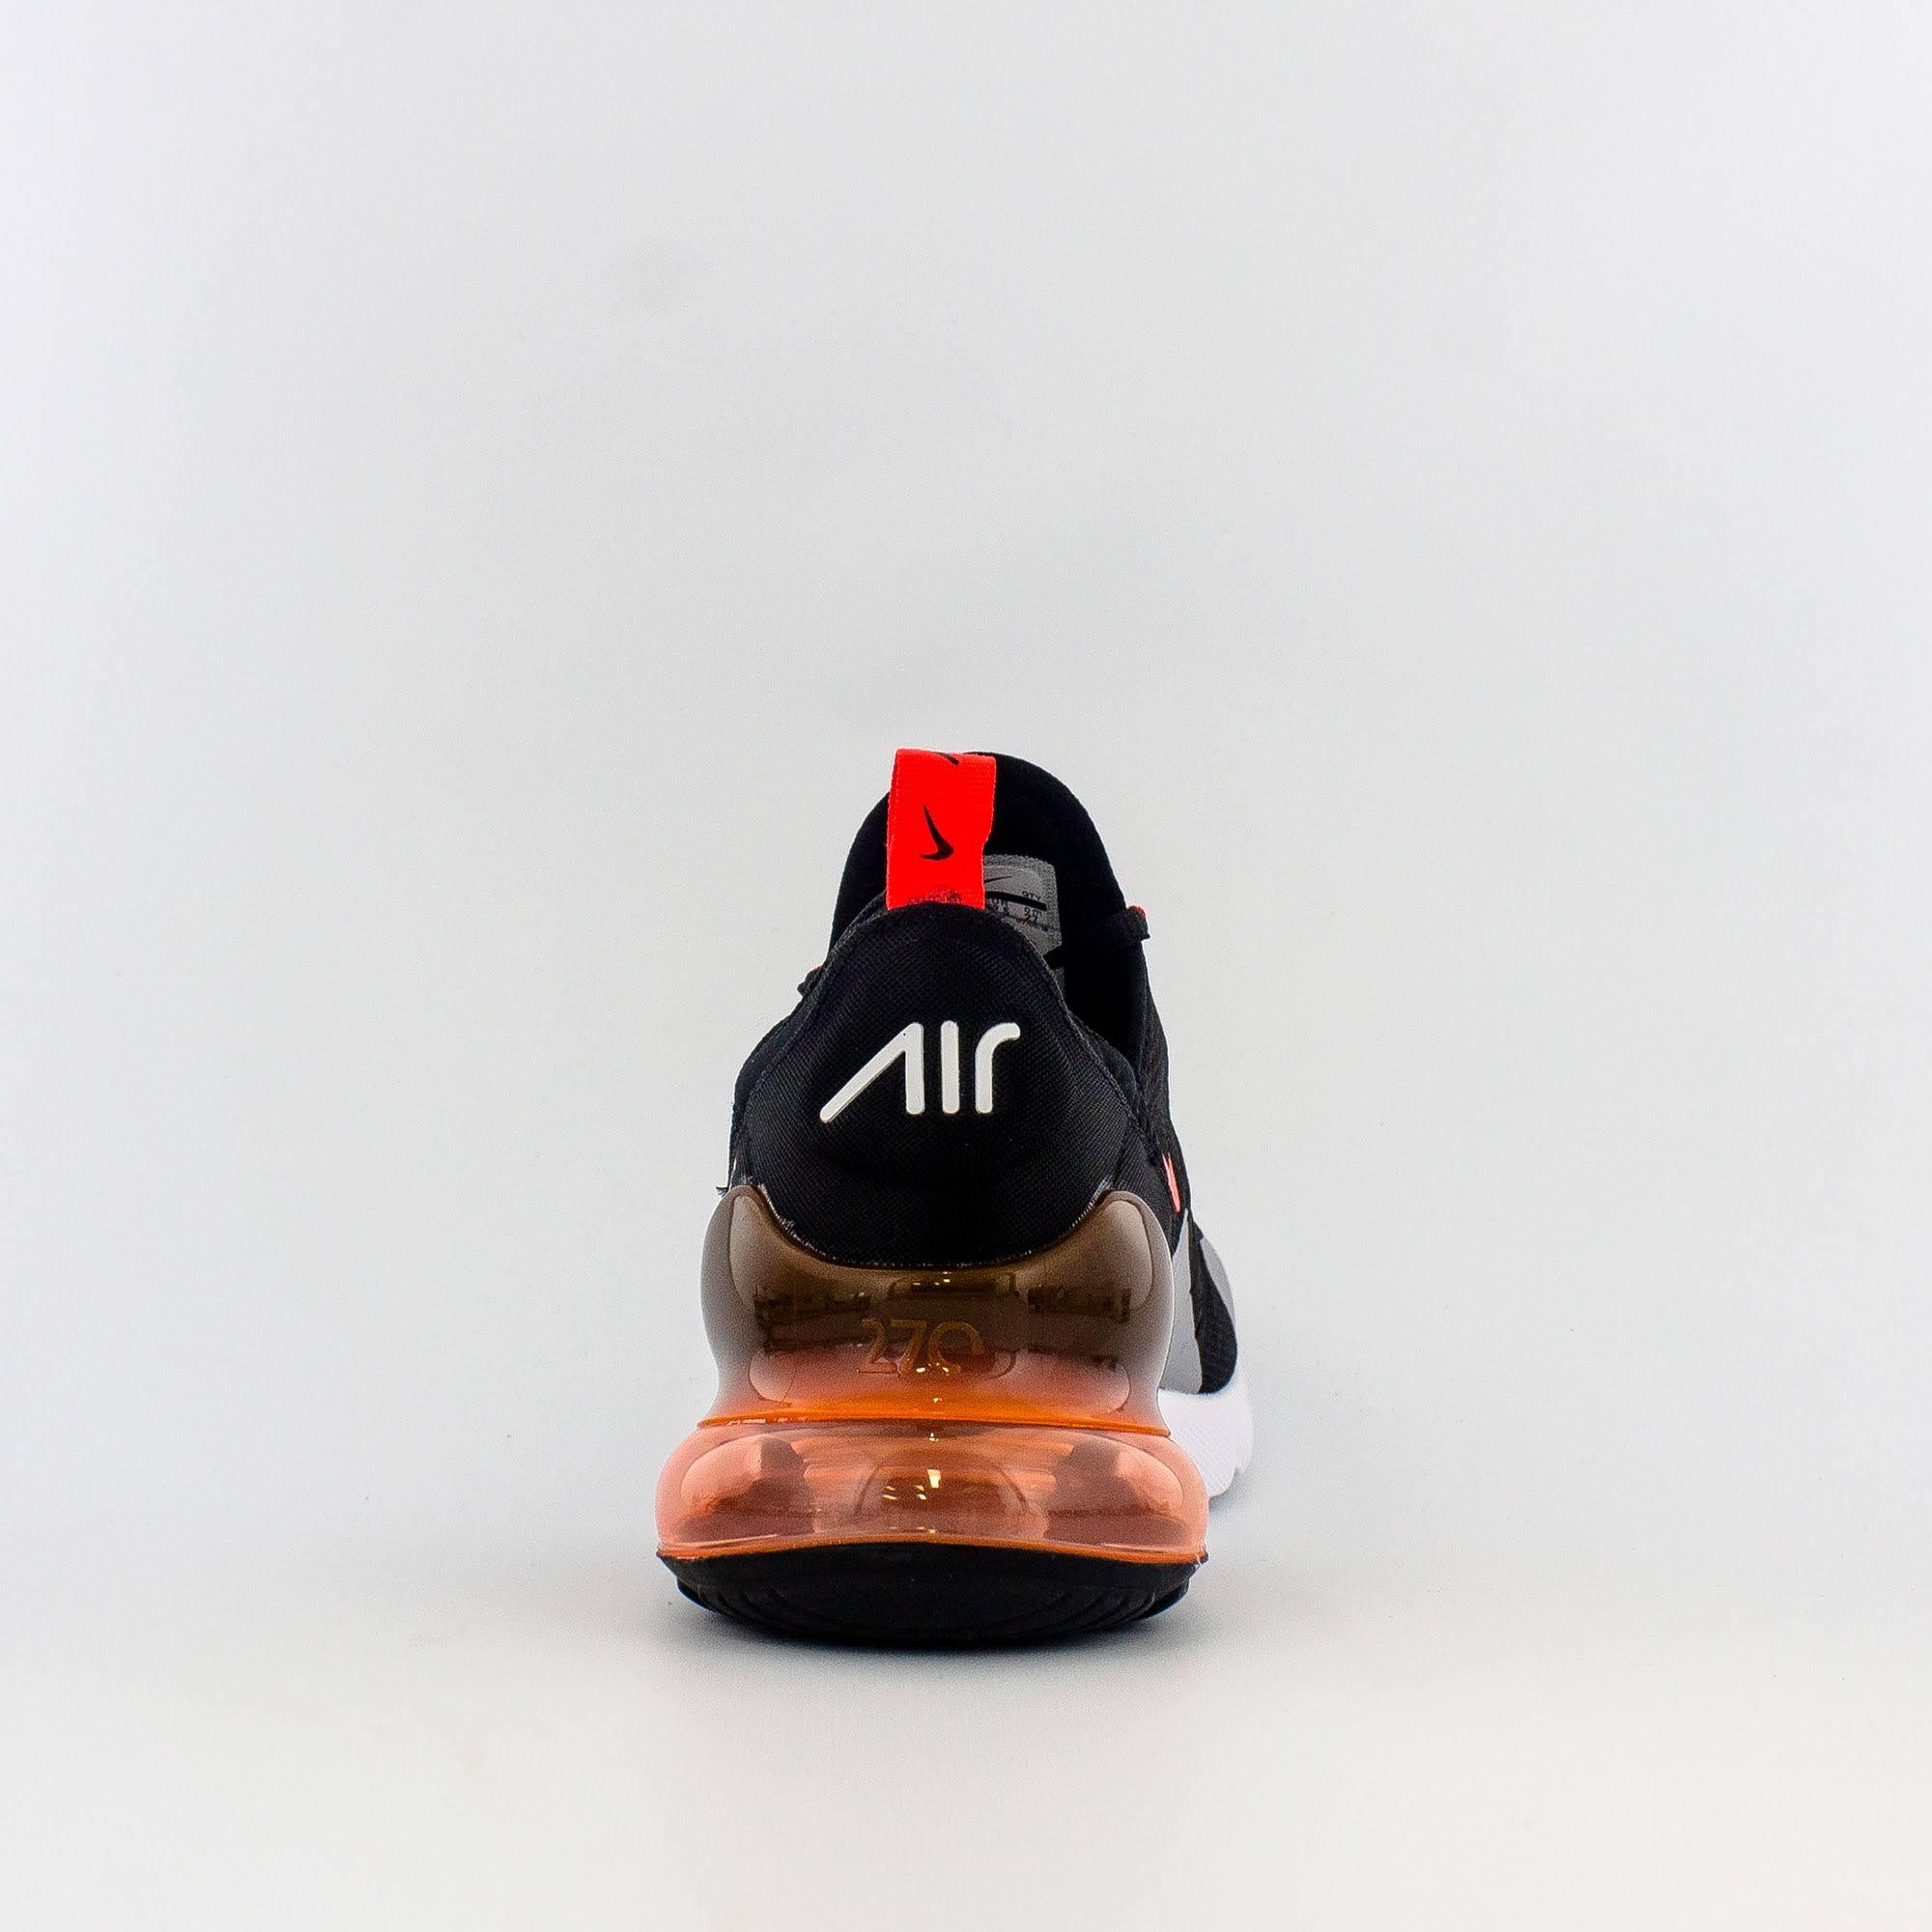 Nike 7 Max Air Größe 5 Herrenschuhe 270 Ah8050015 rAr7Yx